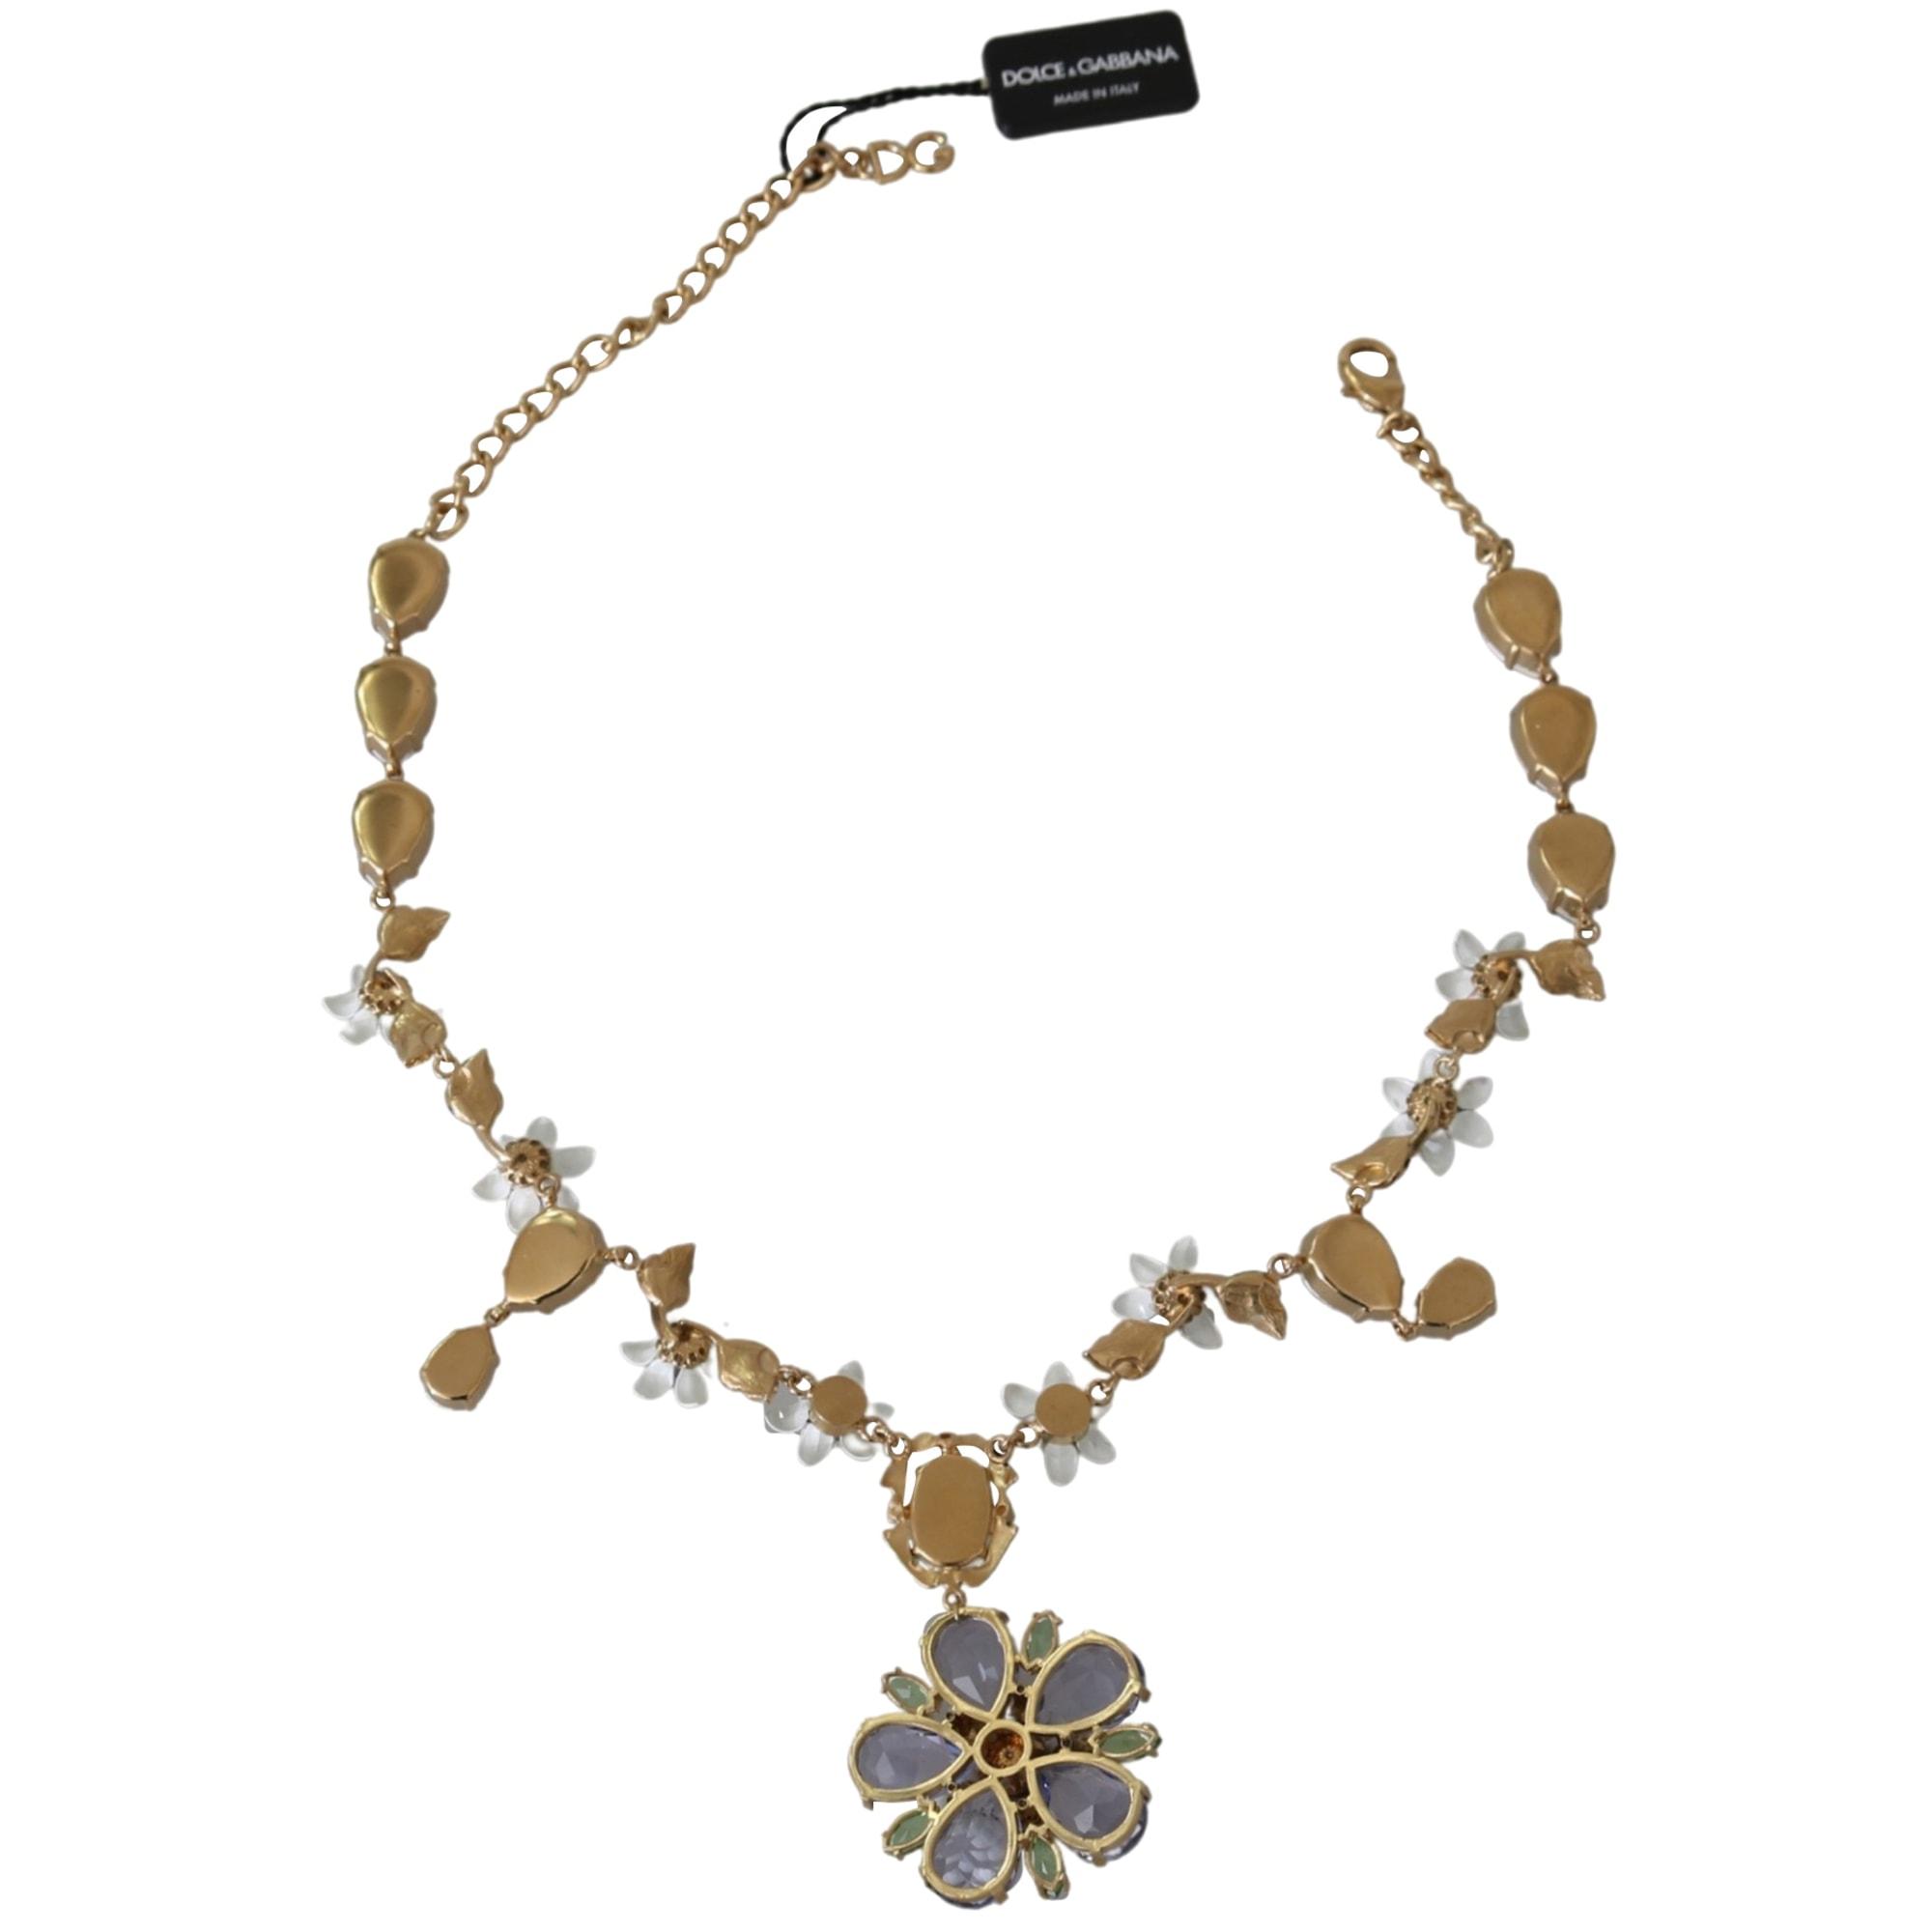 Necklace DOLCE & GABBANA Golden, bronze, copper